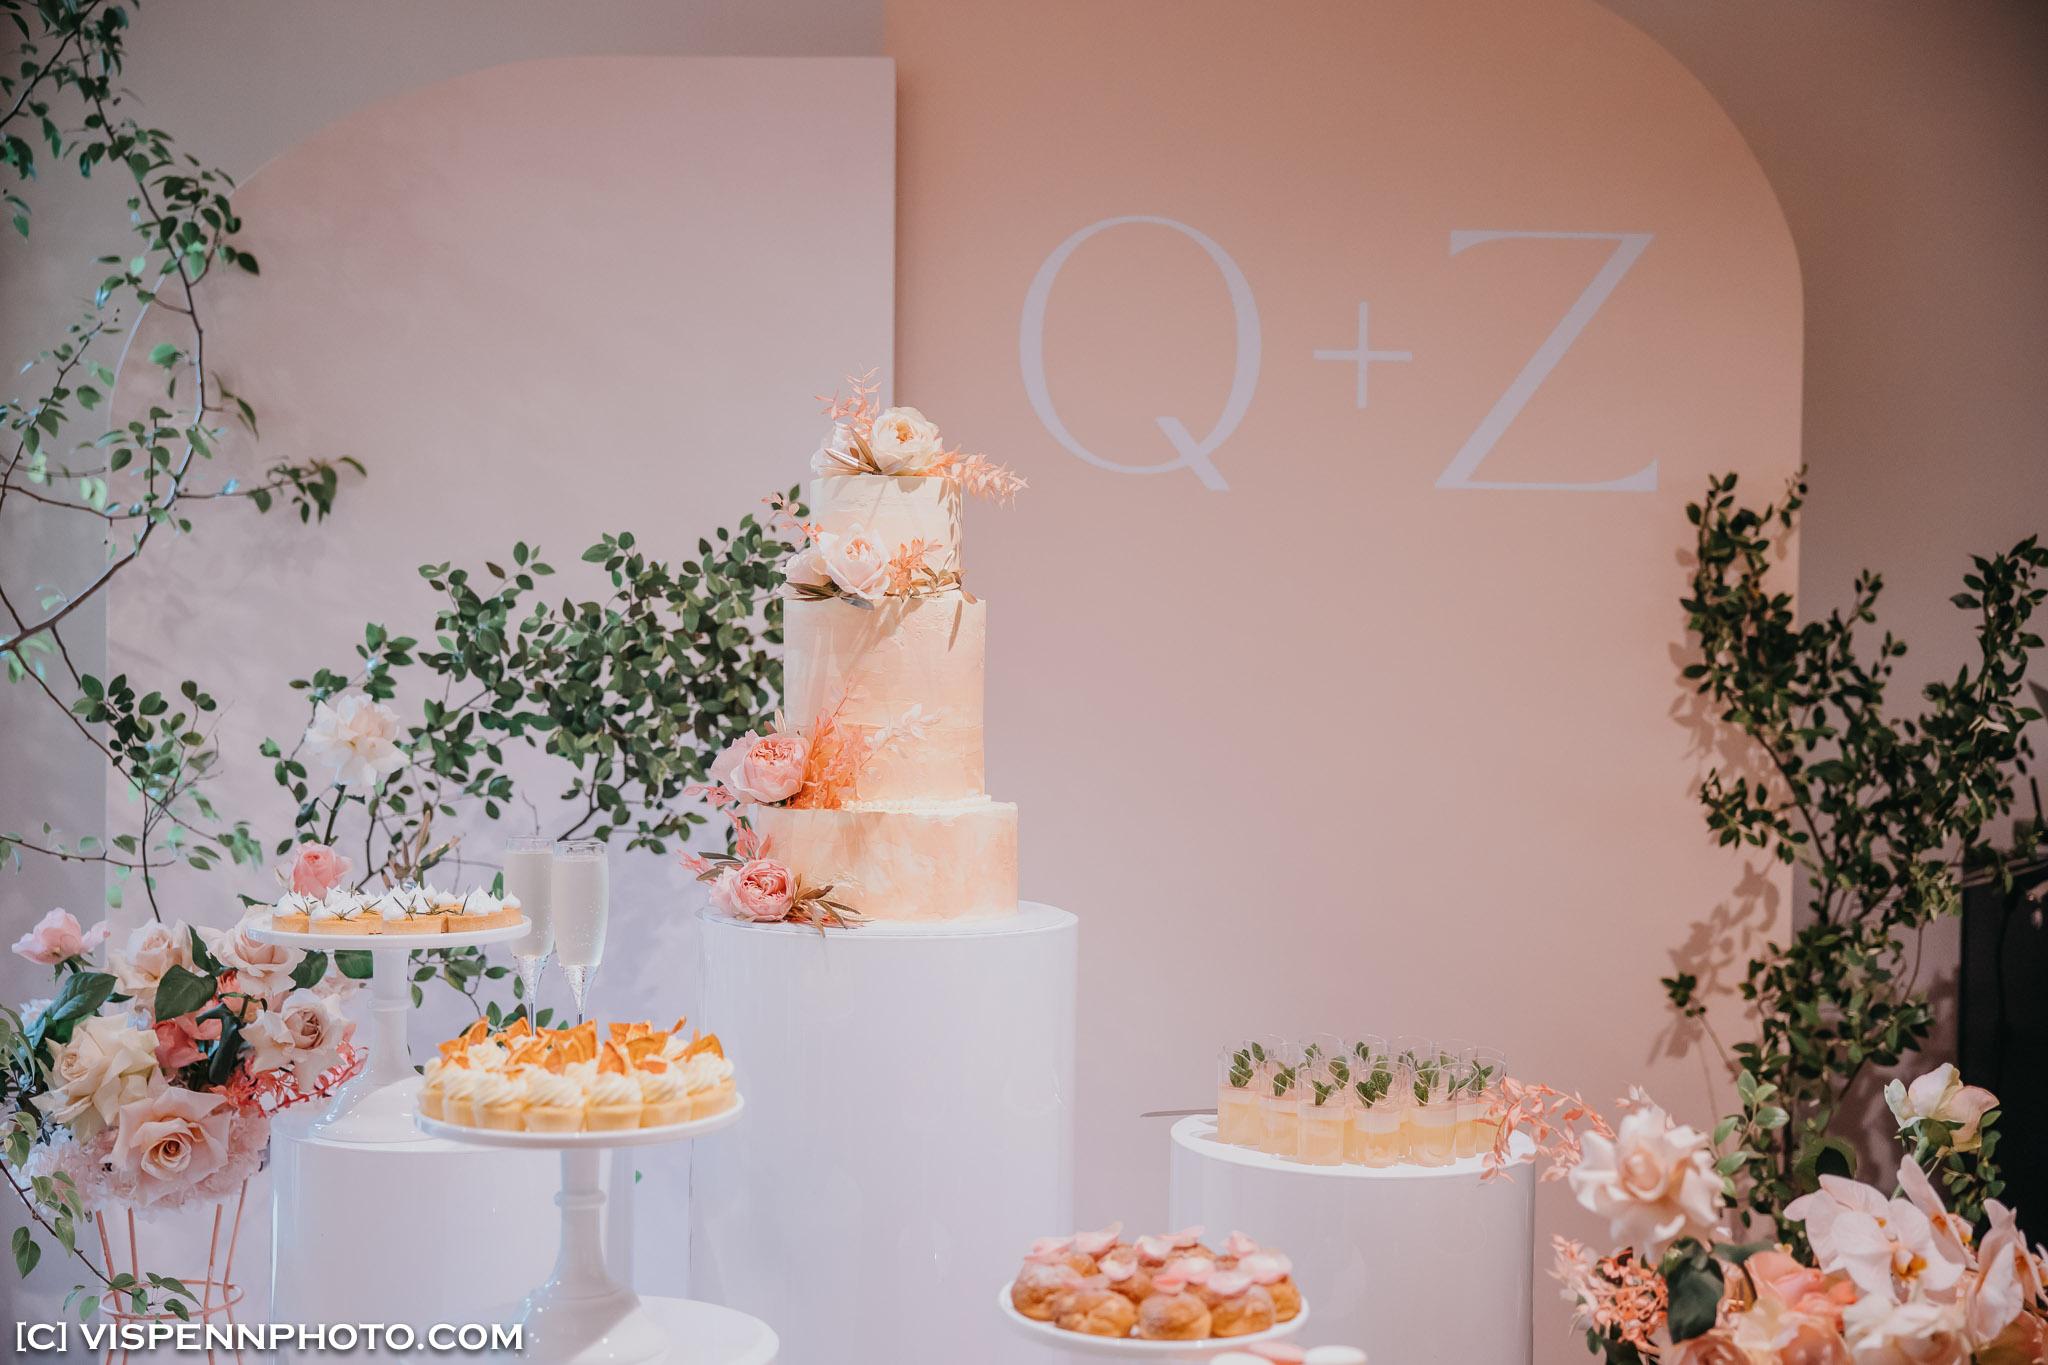 WEDDING DAY Photography Melbourne ElitaPB 09825 1P EOSR ZHPENN